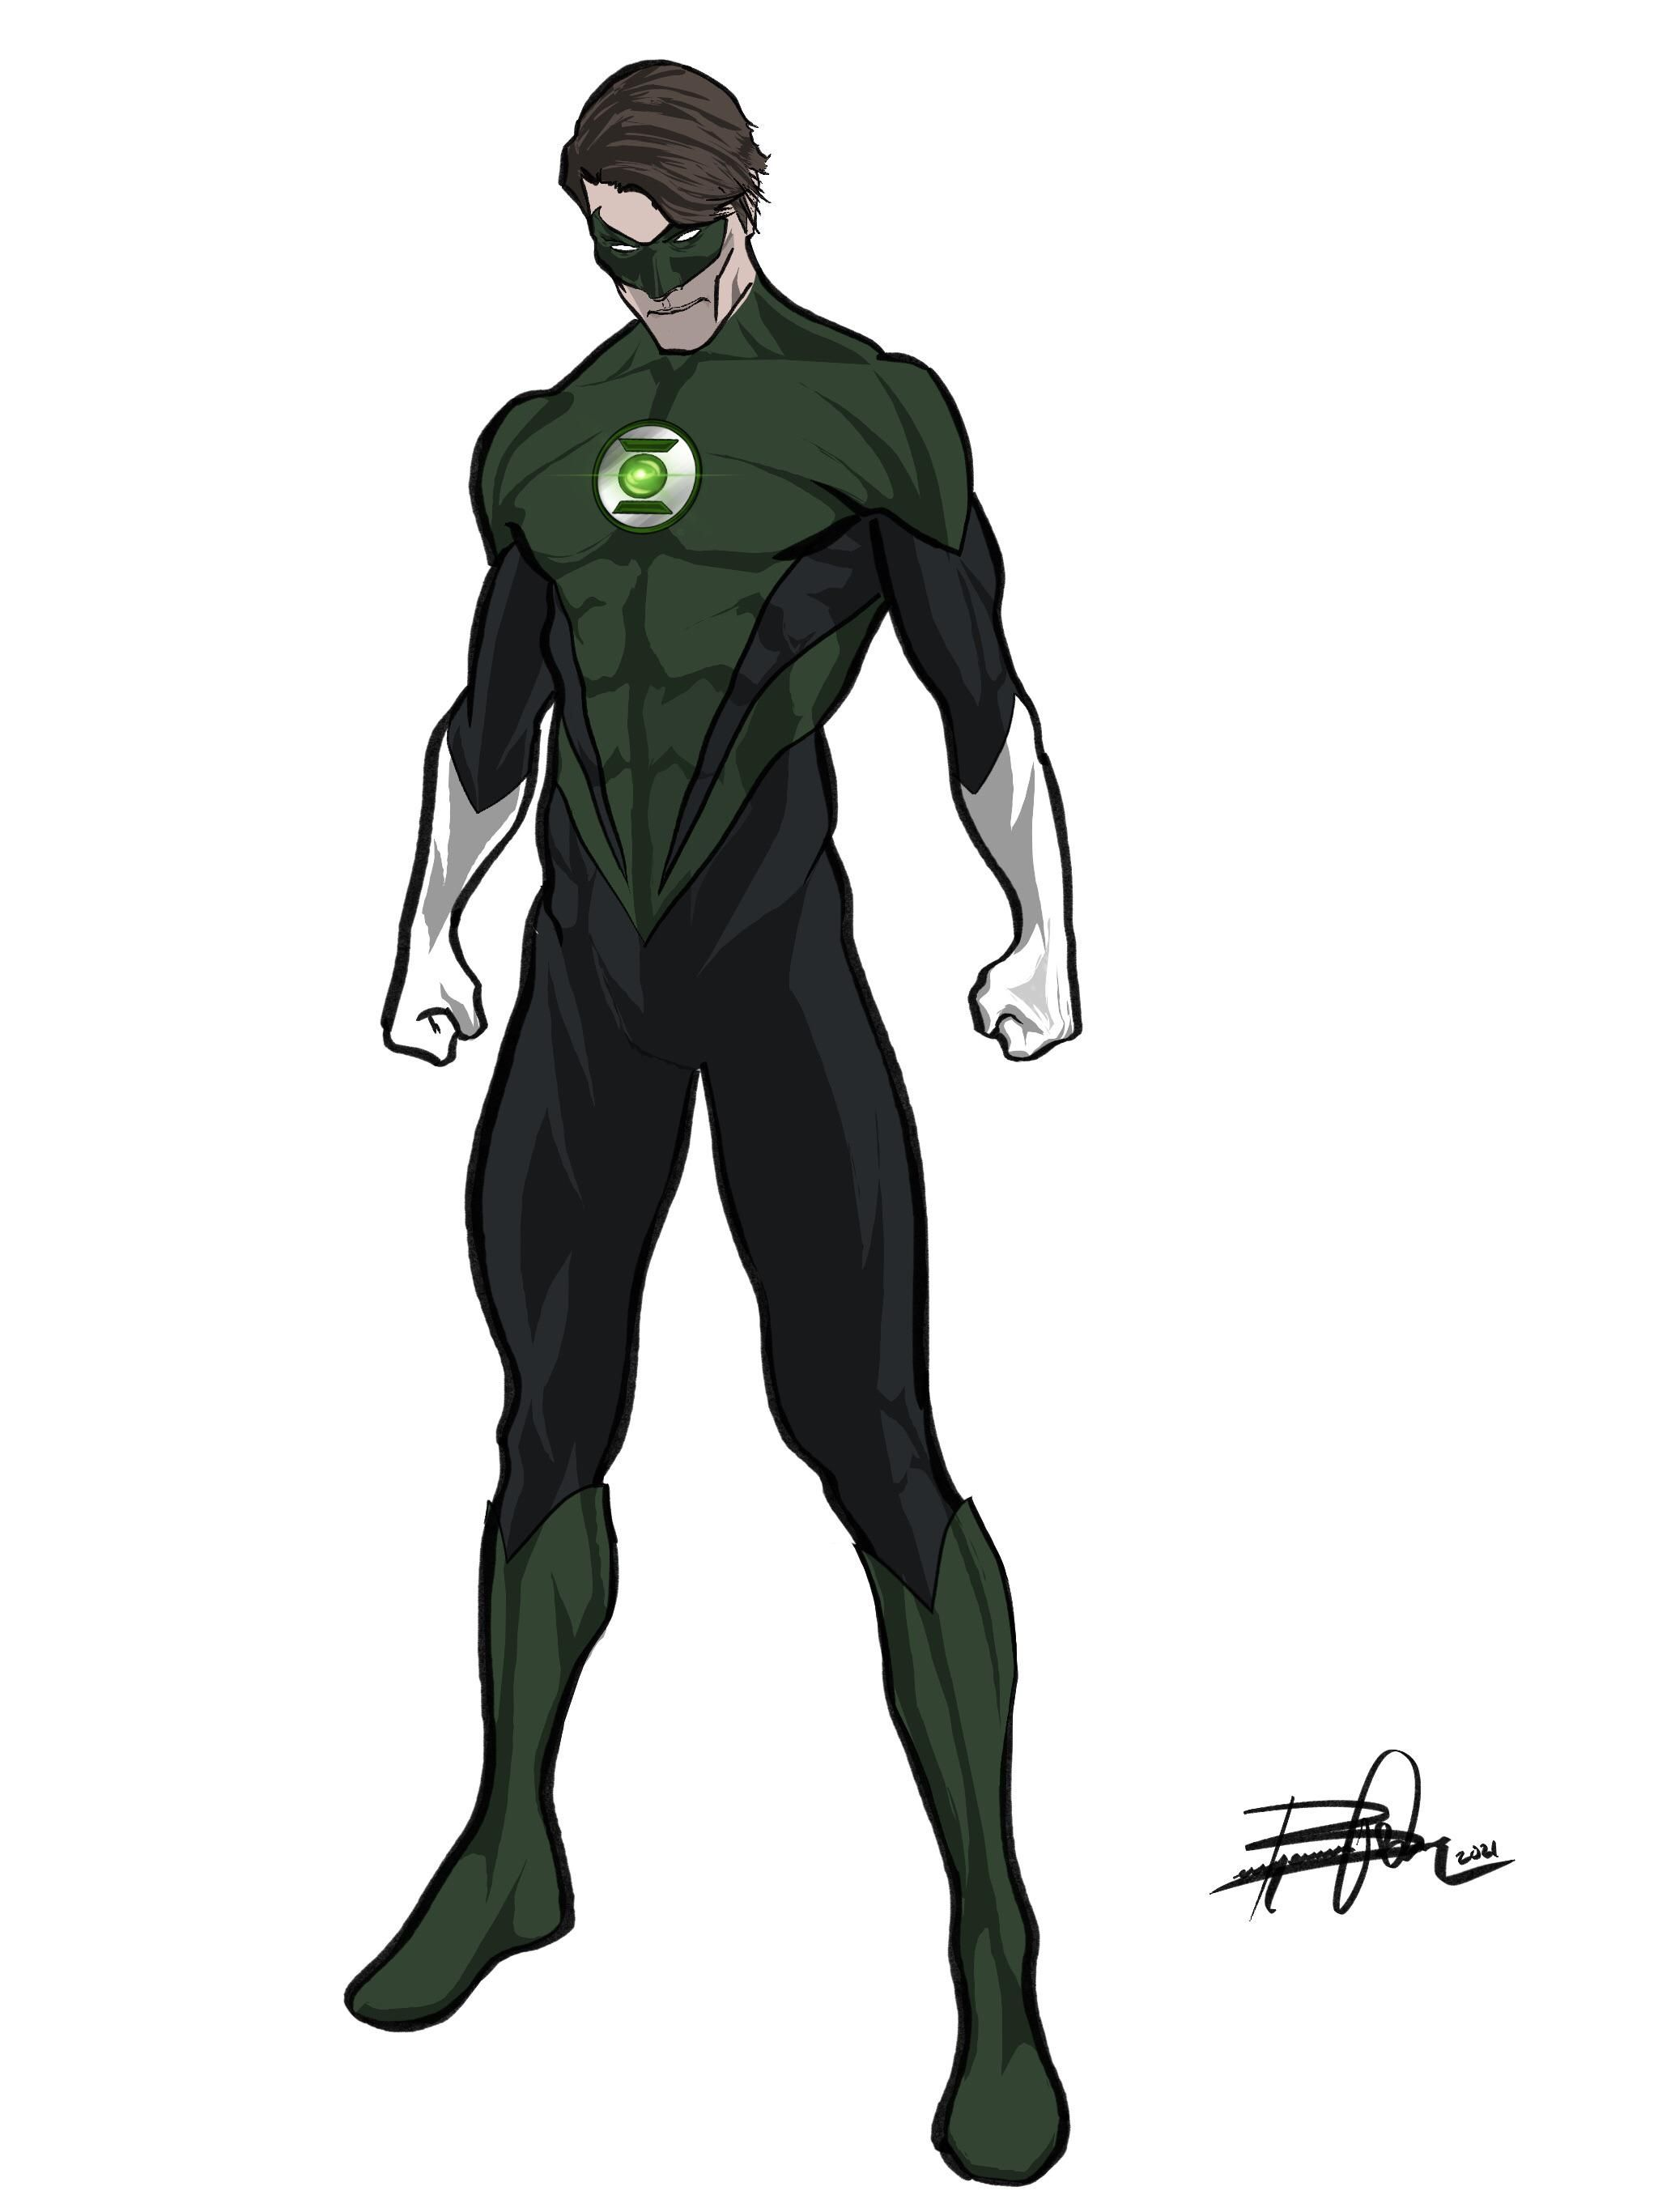 Pin By Oleg Grigorjev On Dc In 2021 Green Lantern Hal Jordan Green Lantern Zelda Characters